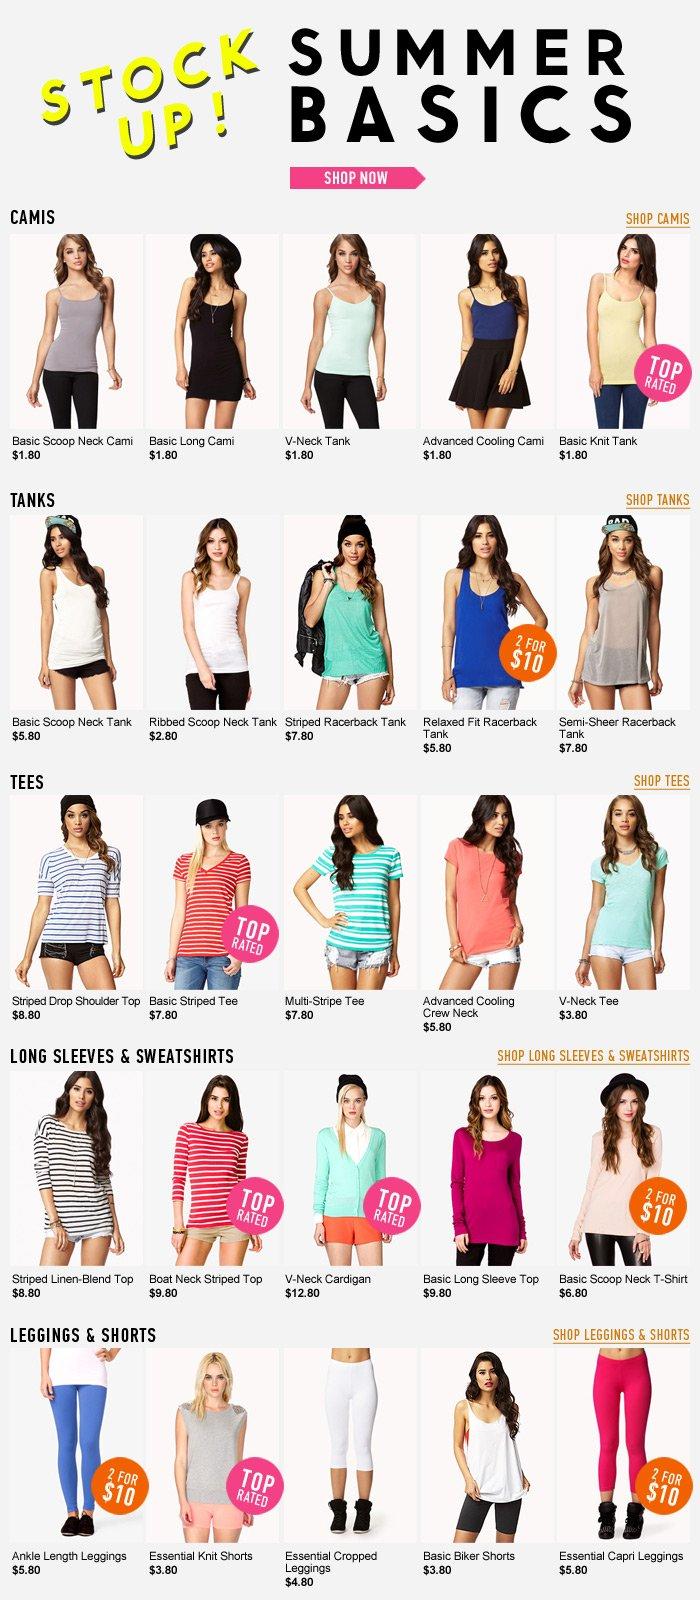 Stock Up On Summer Basics! - Shop Now